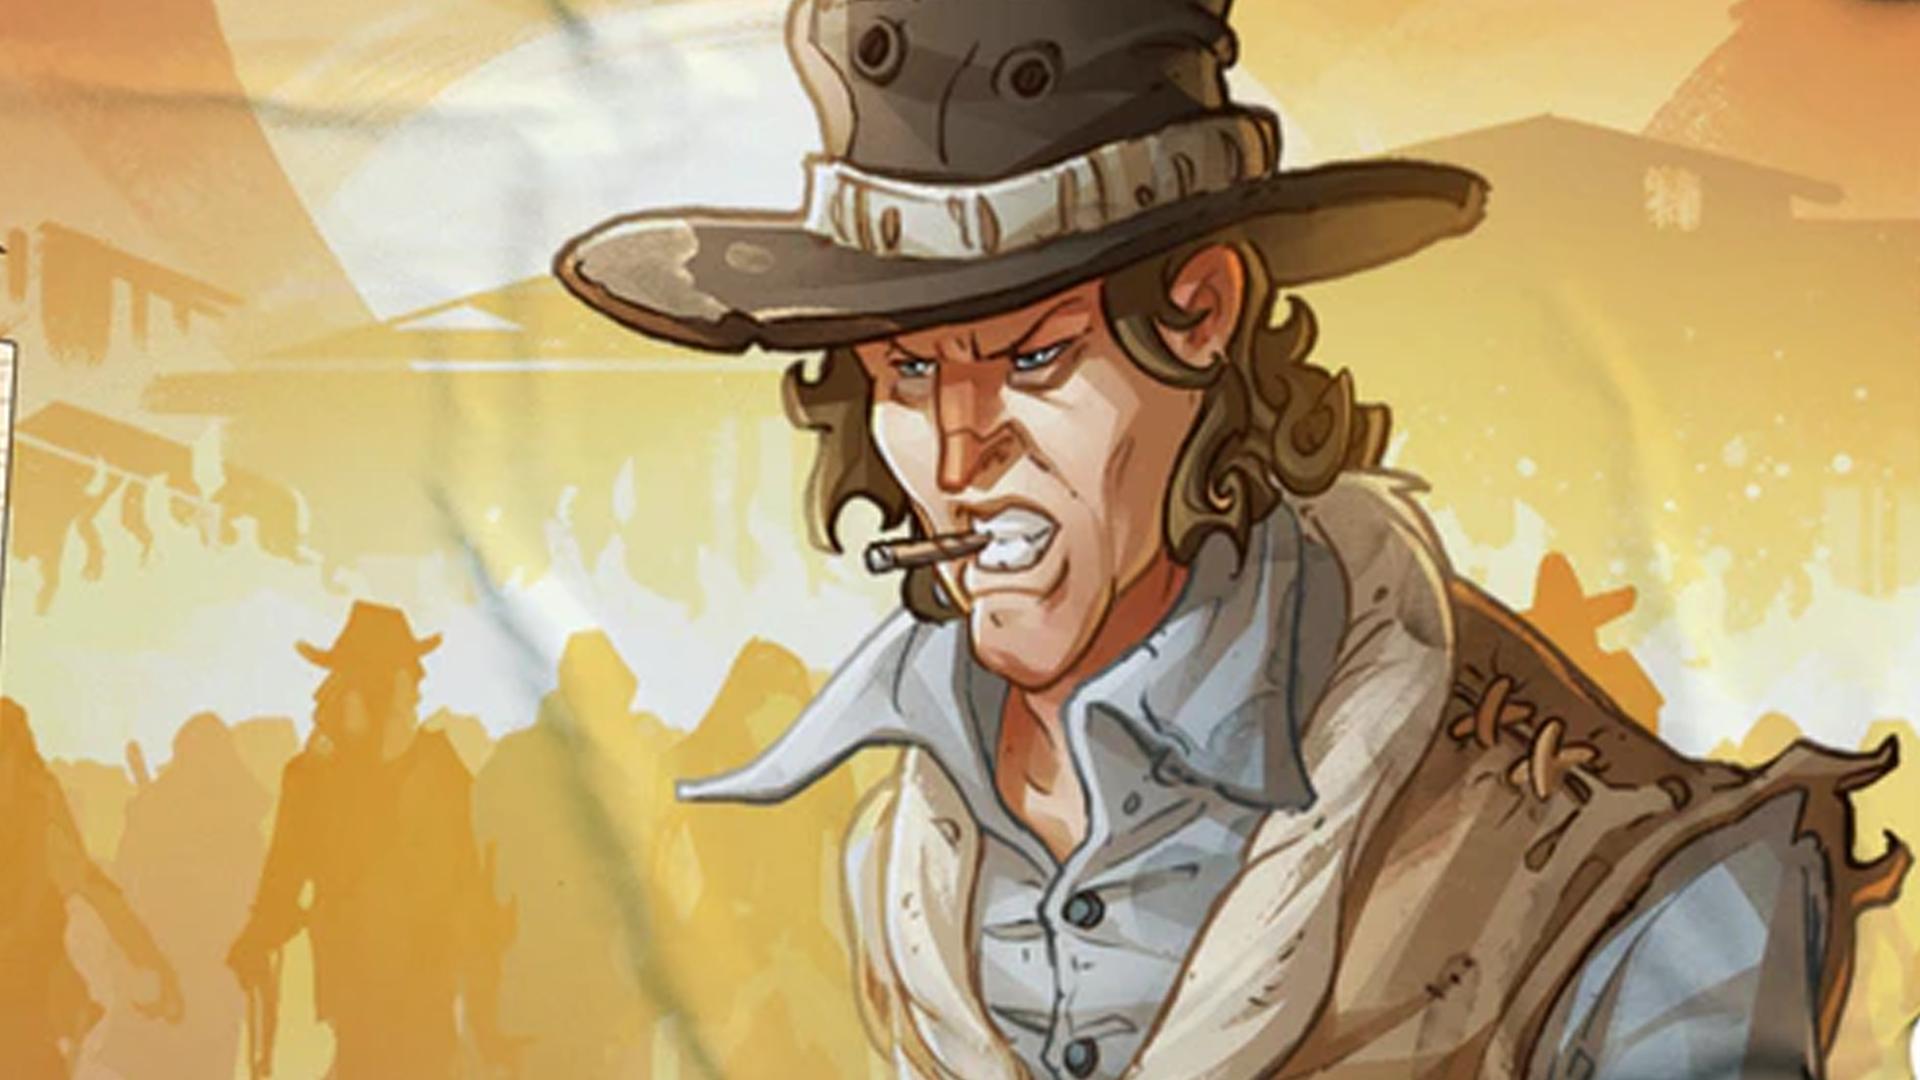 Zombicide: Undead or Alive board game artwork